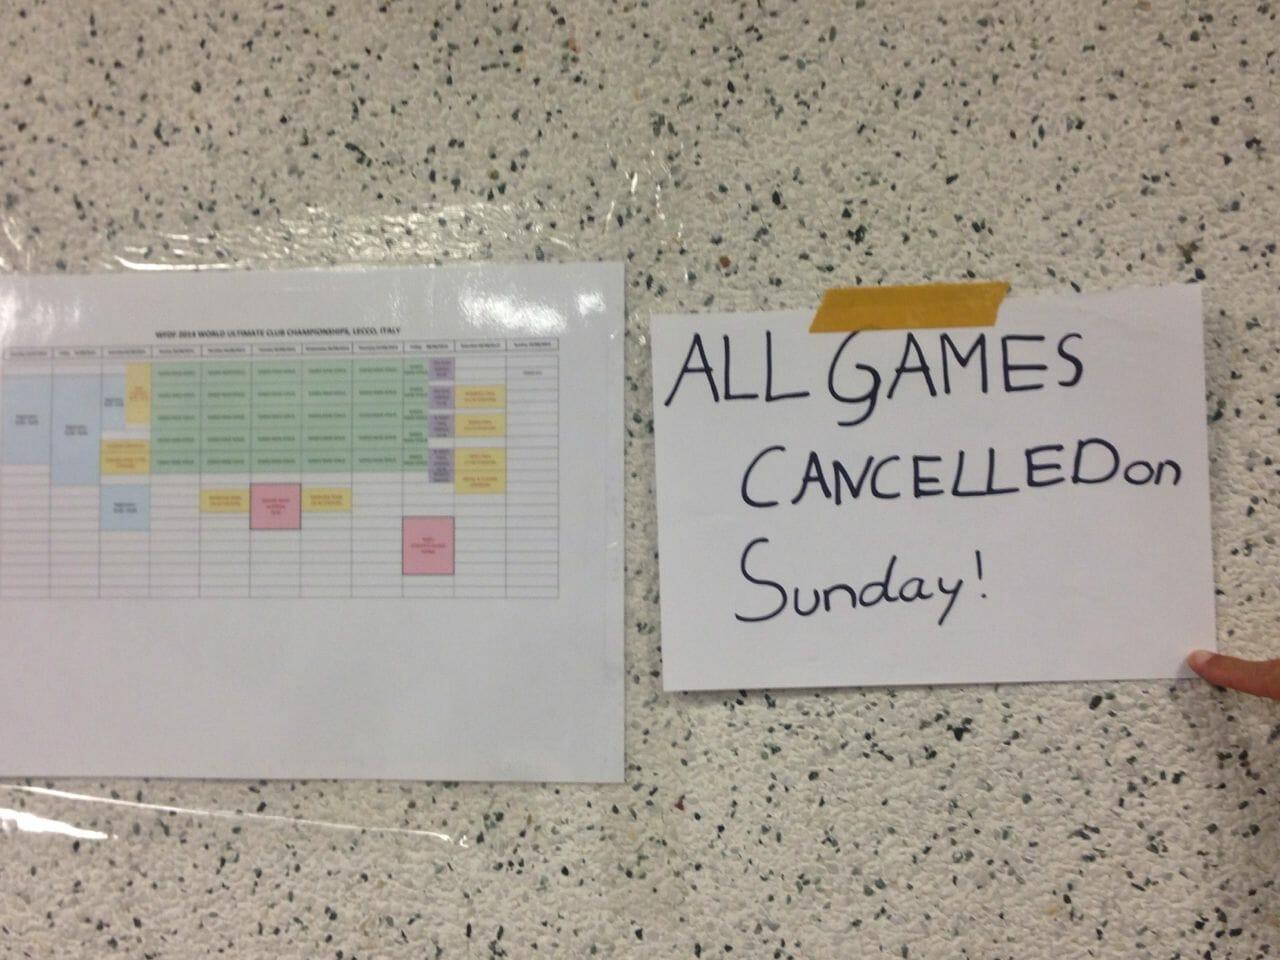 Games were canceled on Sunday around 9 PM Saturday night.